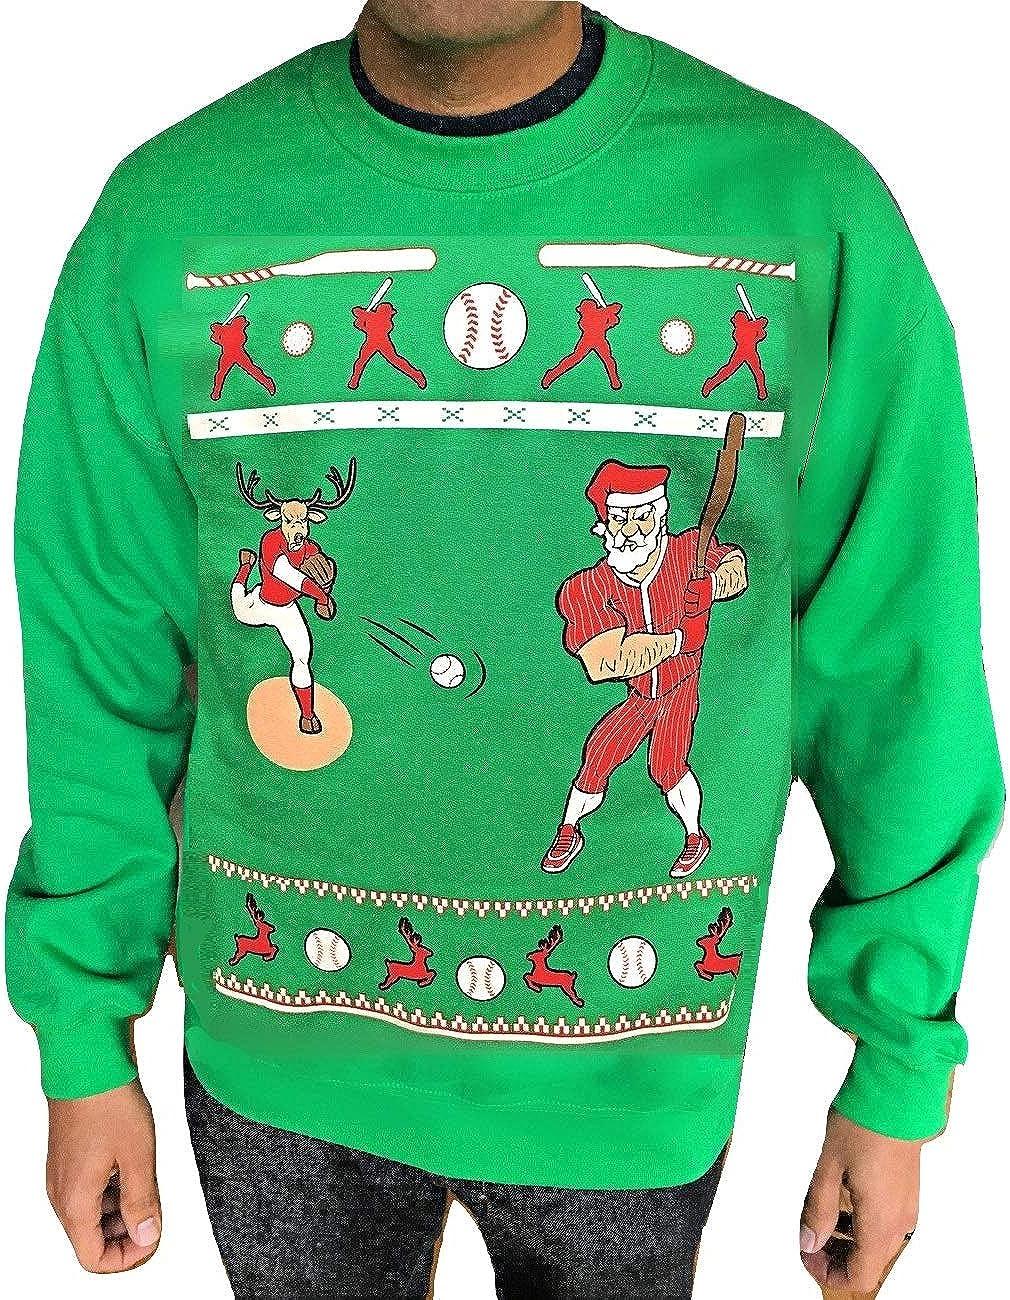 Baseball Slugger Santa Ugly Christmas Sweater Funny Christmas Sweatshirt for Men and Women